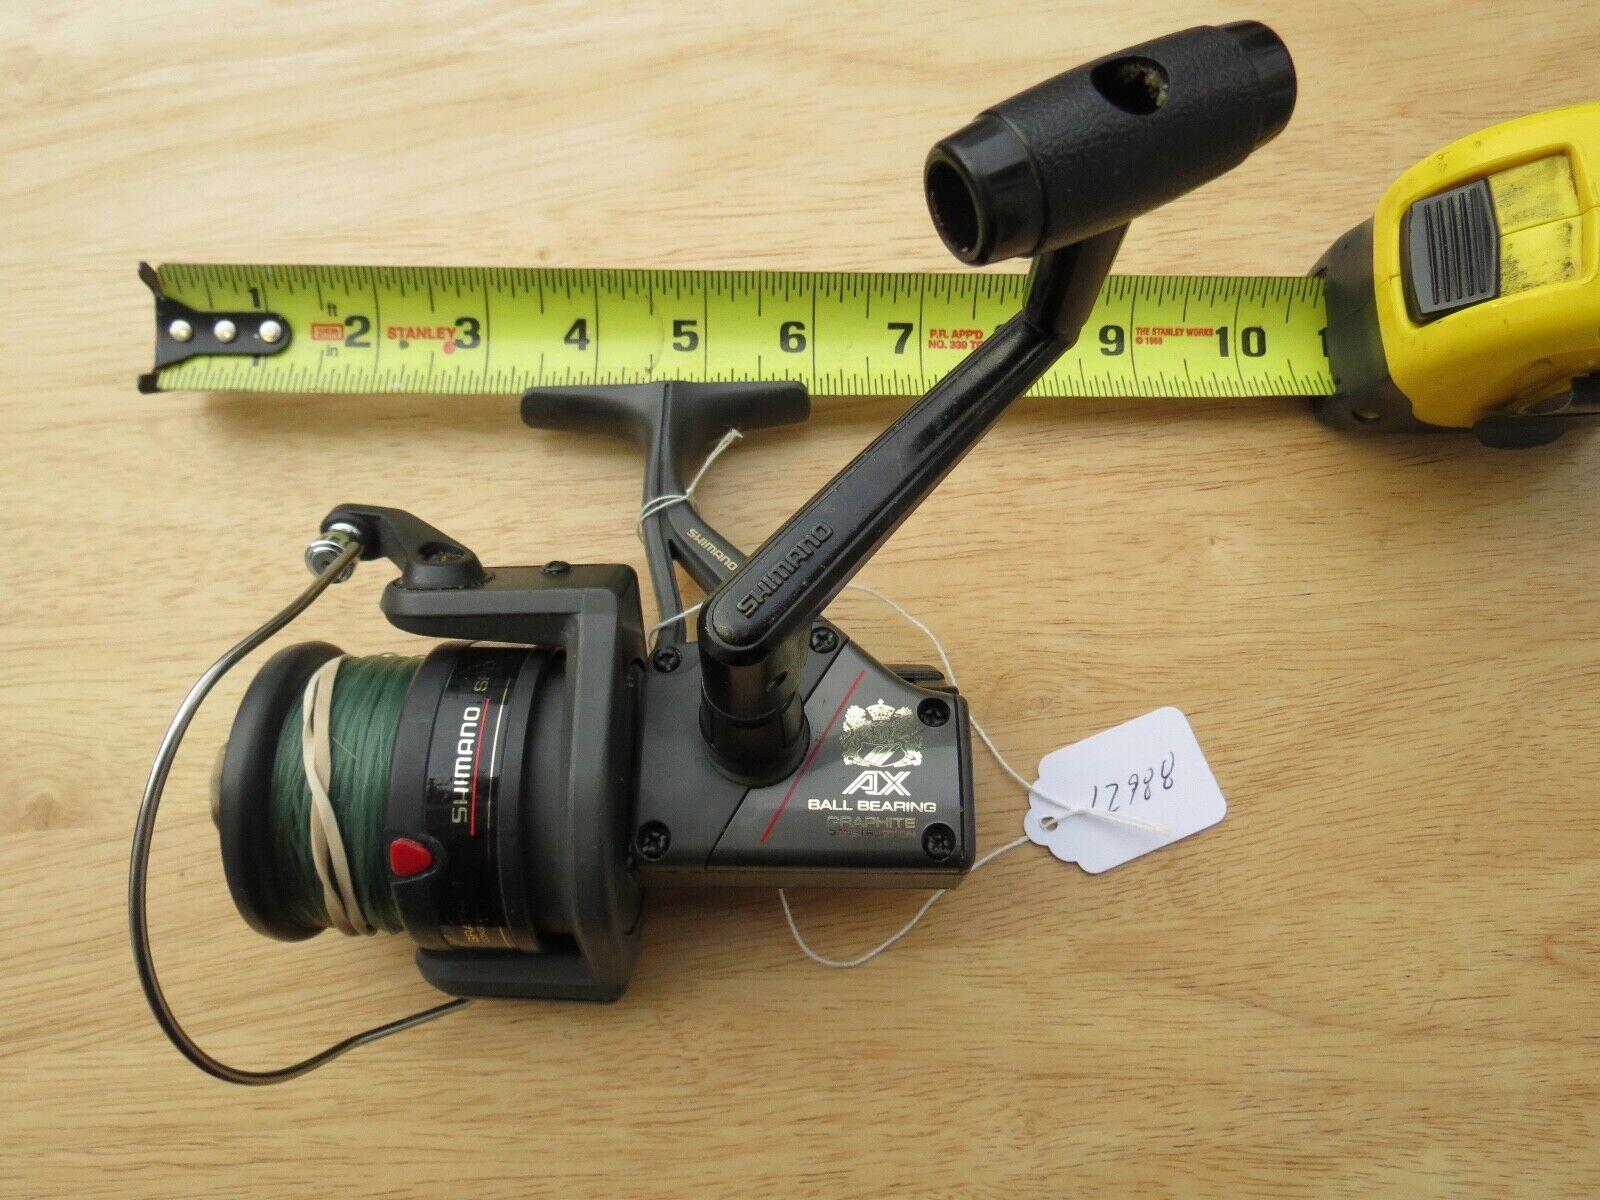 Shimano 400S AX Surf fishing reel made in Japan (Lot)